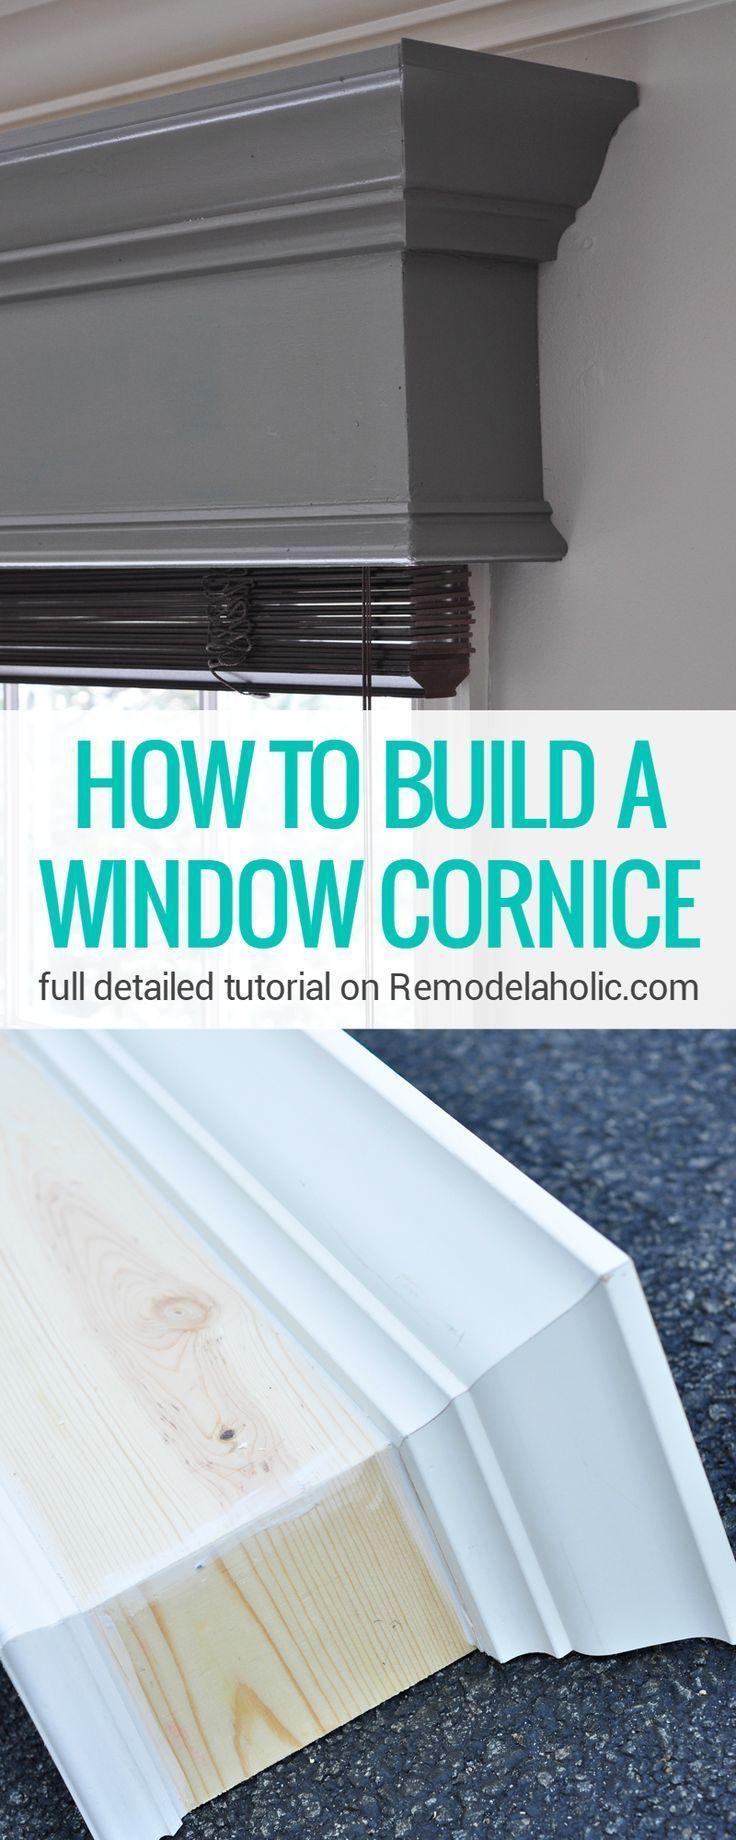 This DIY window cornice gives windows a